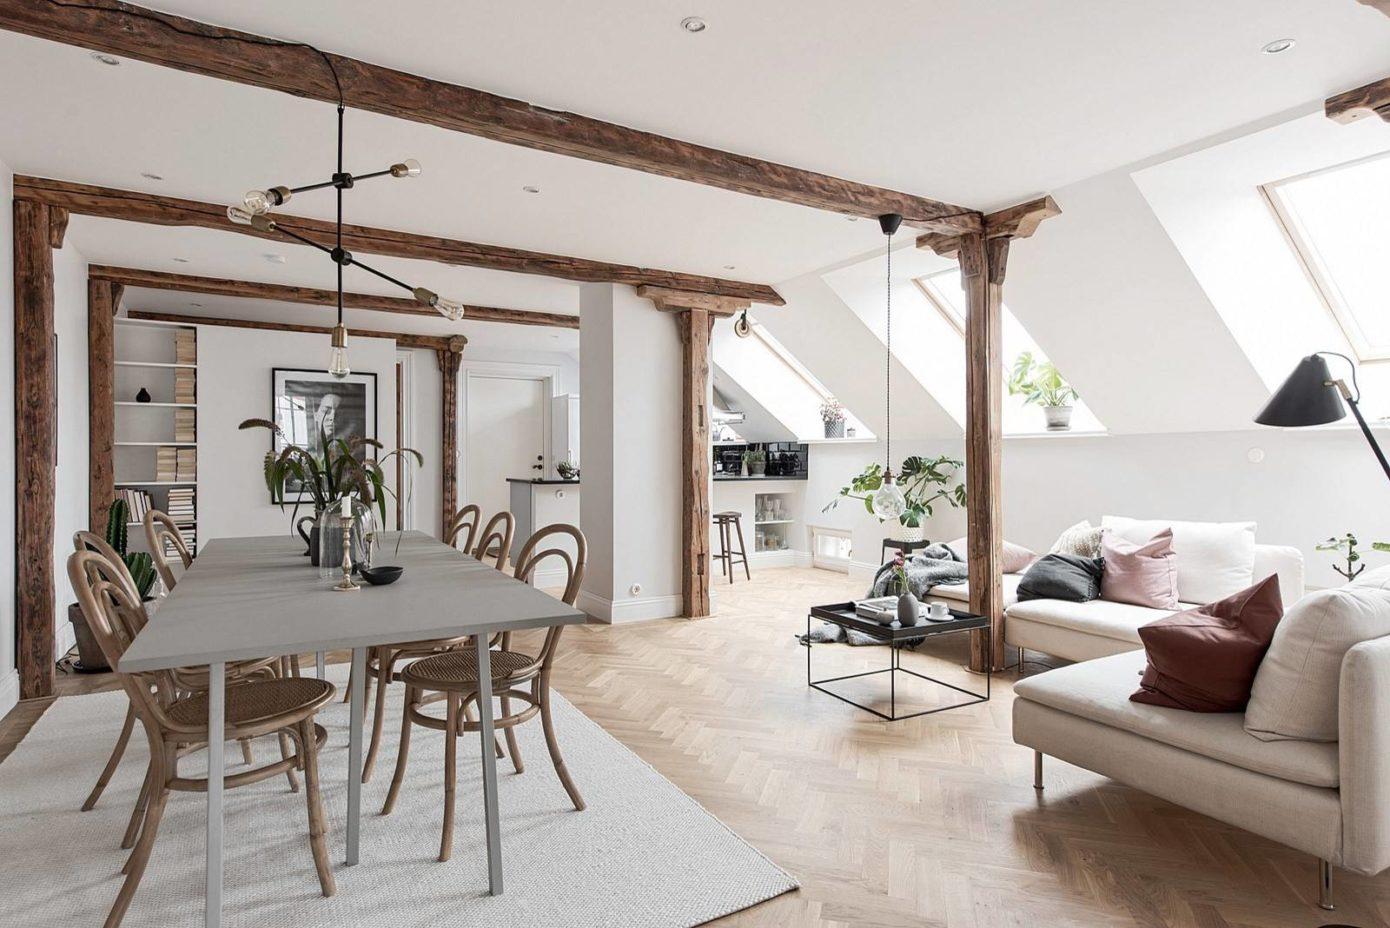 Attic Apartment in Gothenburg by Bjurfors Göteborg